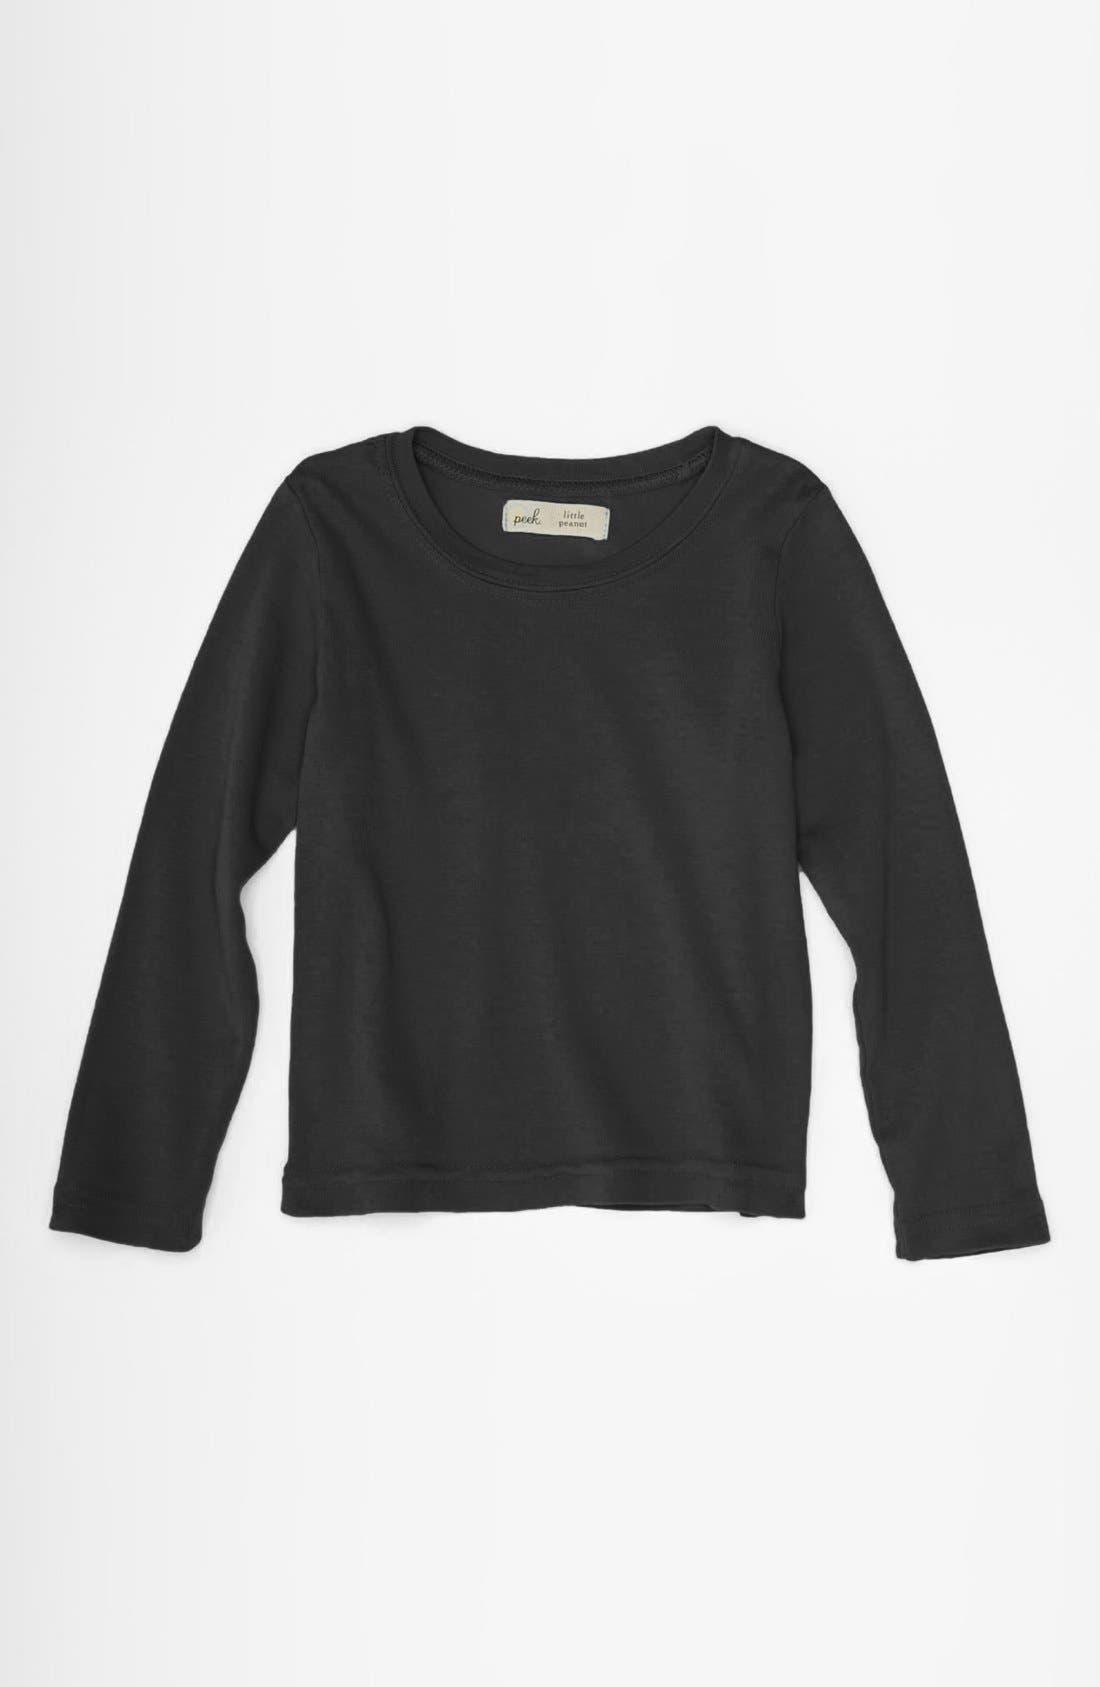 Alternate Image 1 Selected - Peek 'Little Peanut' Long Sleeve T-Shirt (Baby)